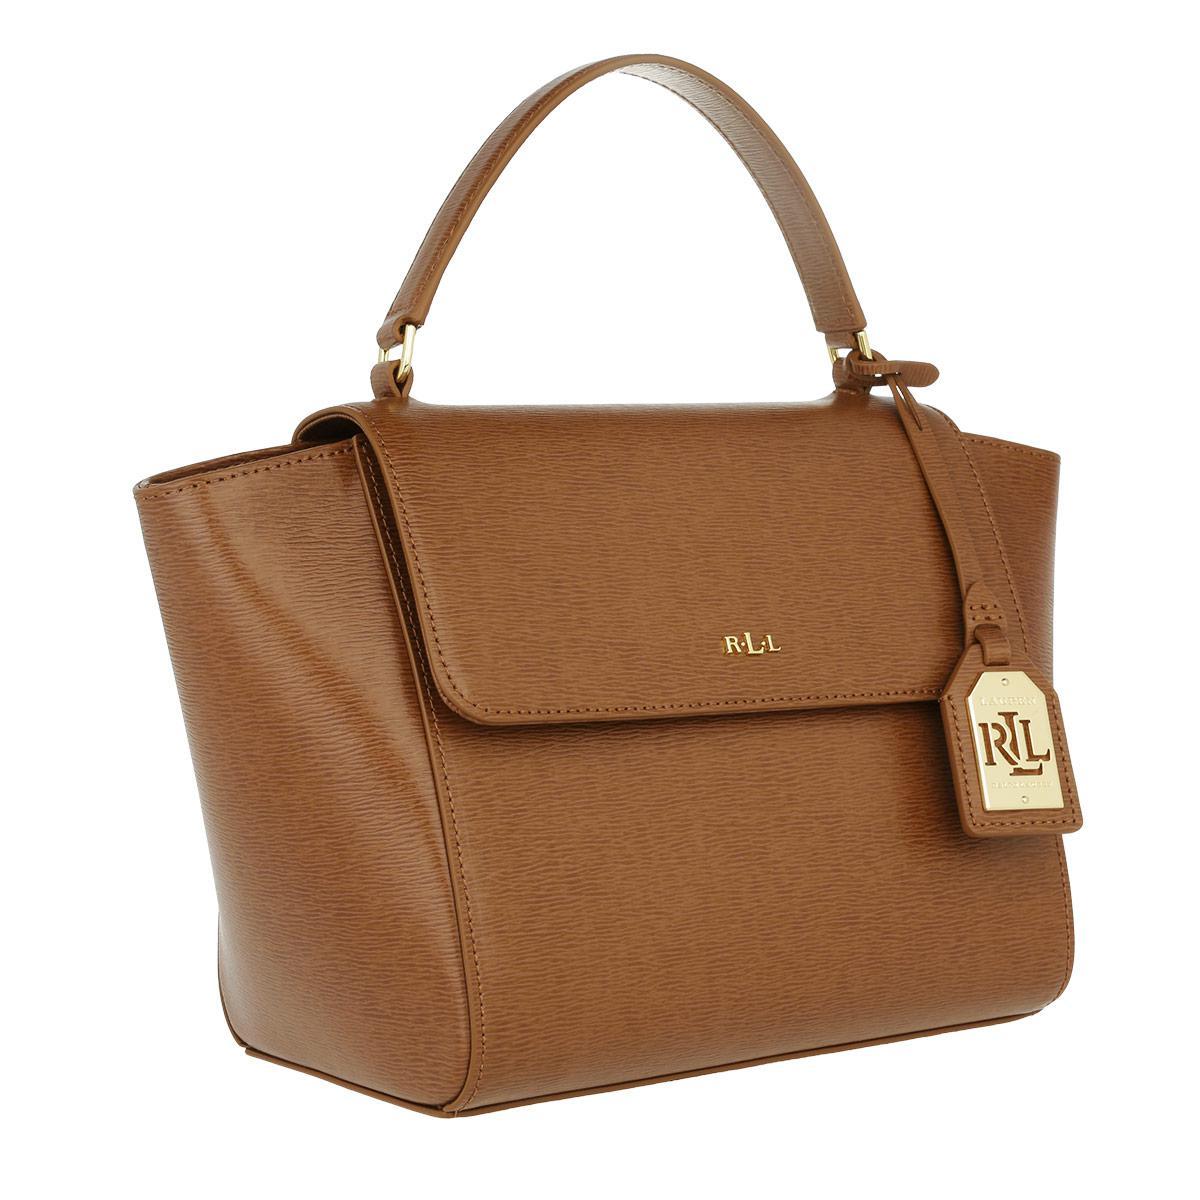 7f7b5c481 Lauren by Ralph Lauren Barclay Leather Crossbody Bag Tan in Brown - Lyst